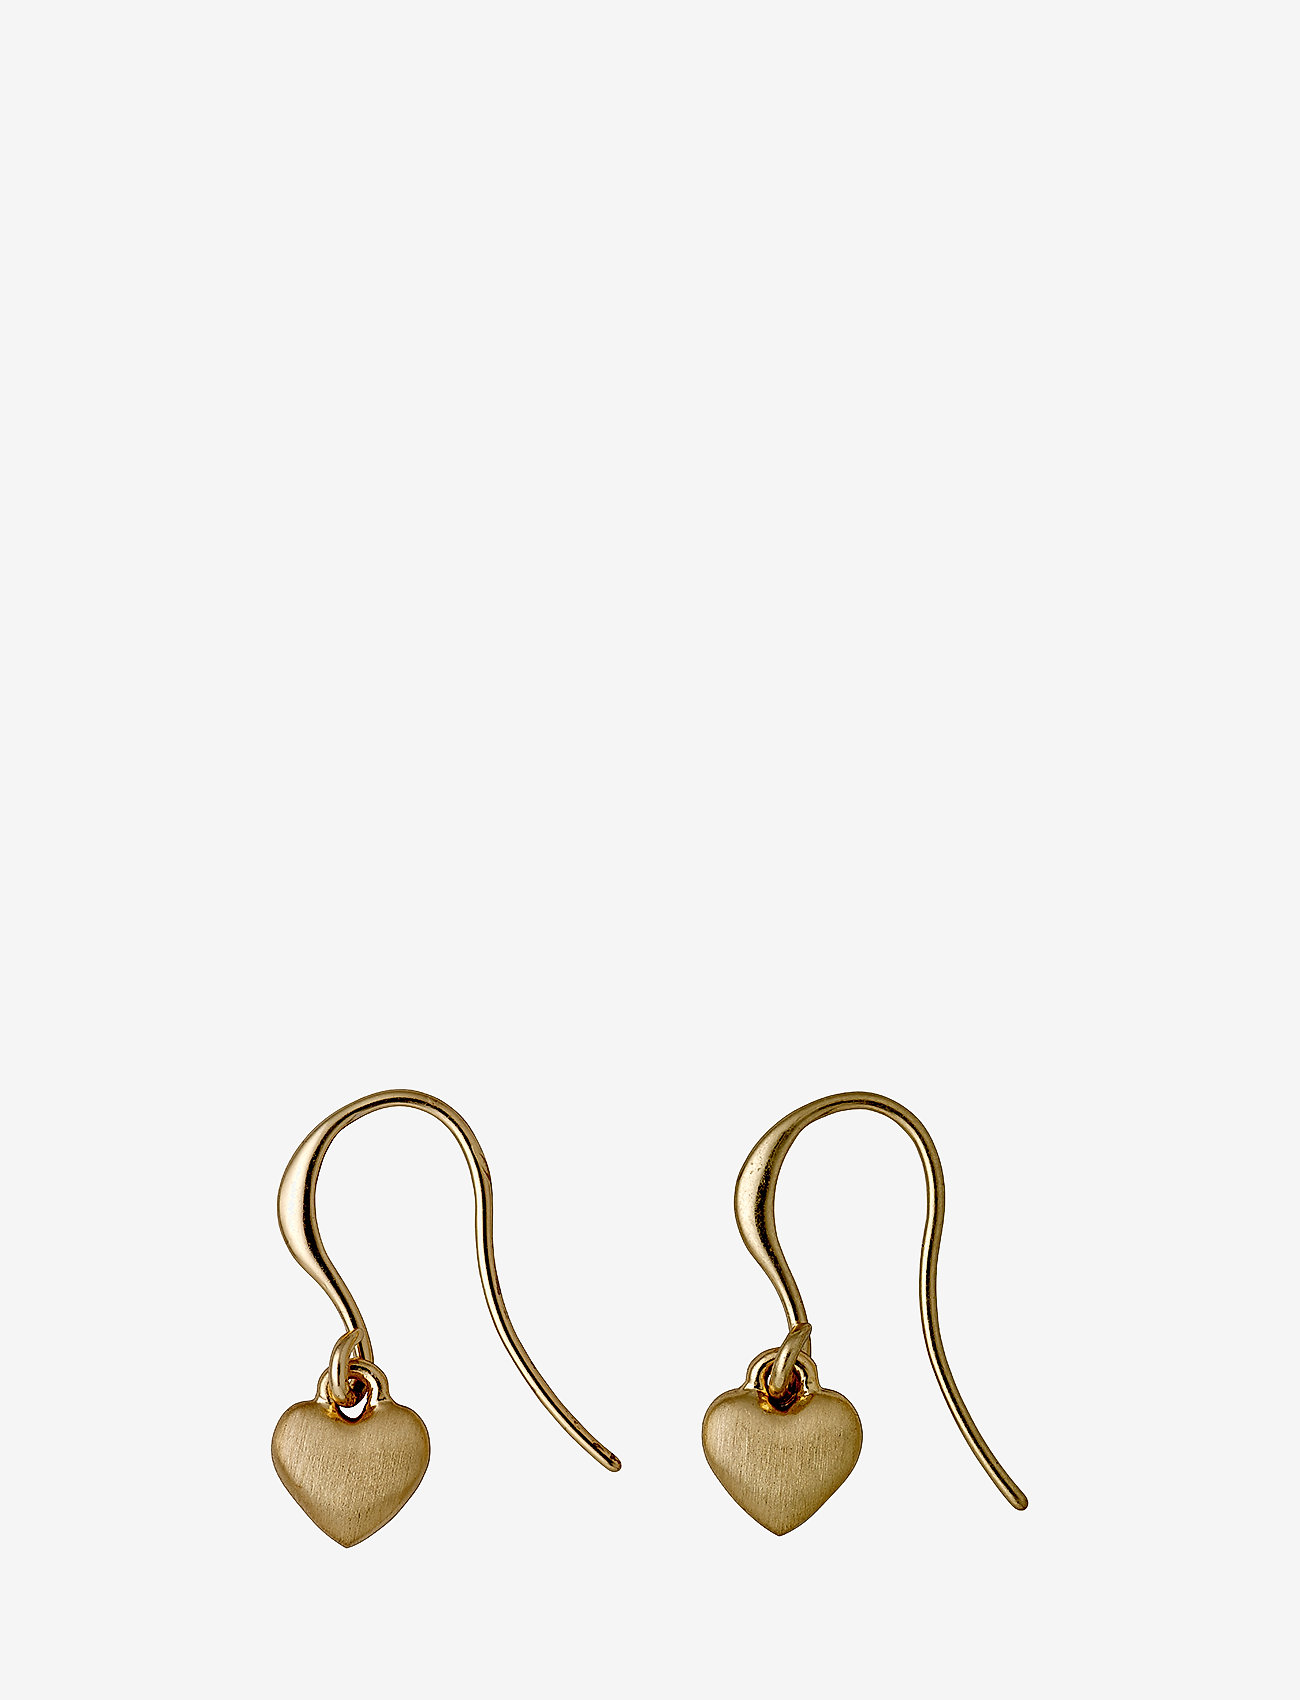 Pilgrim - Sophia - pendant - gold plated